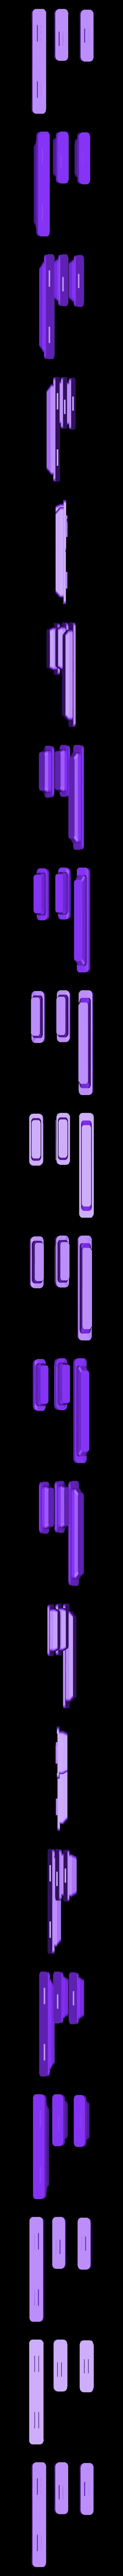 cova113_buttons.stl Download free STL file Fairphone 2 cover • 3D printer model, unwohlpol